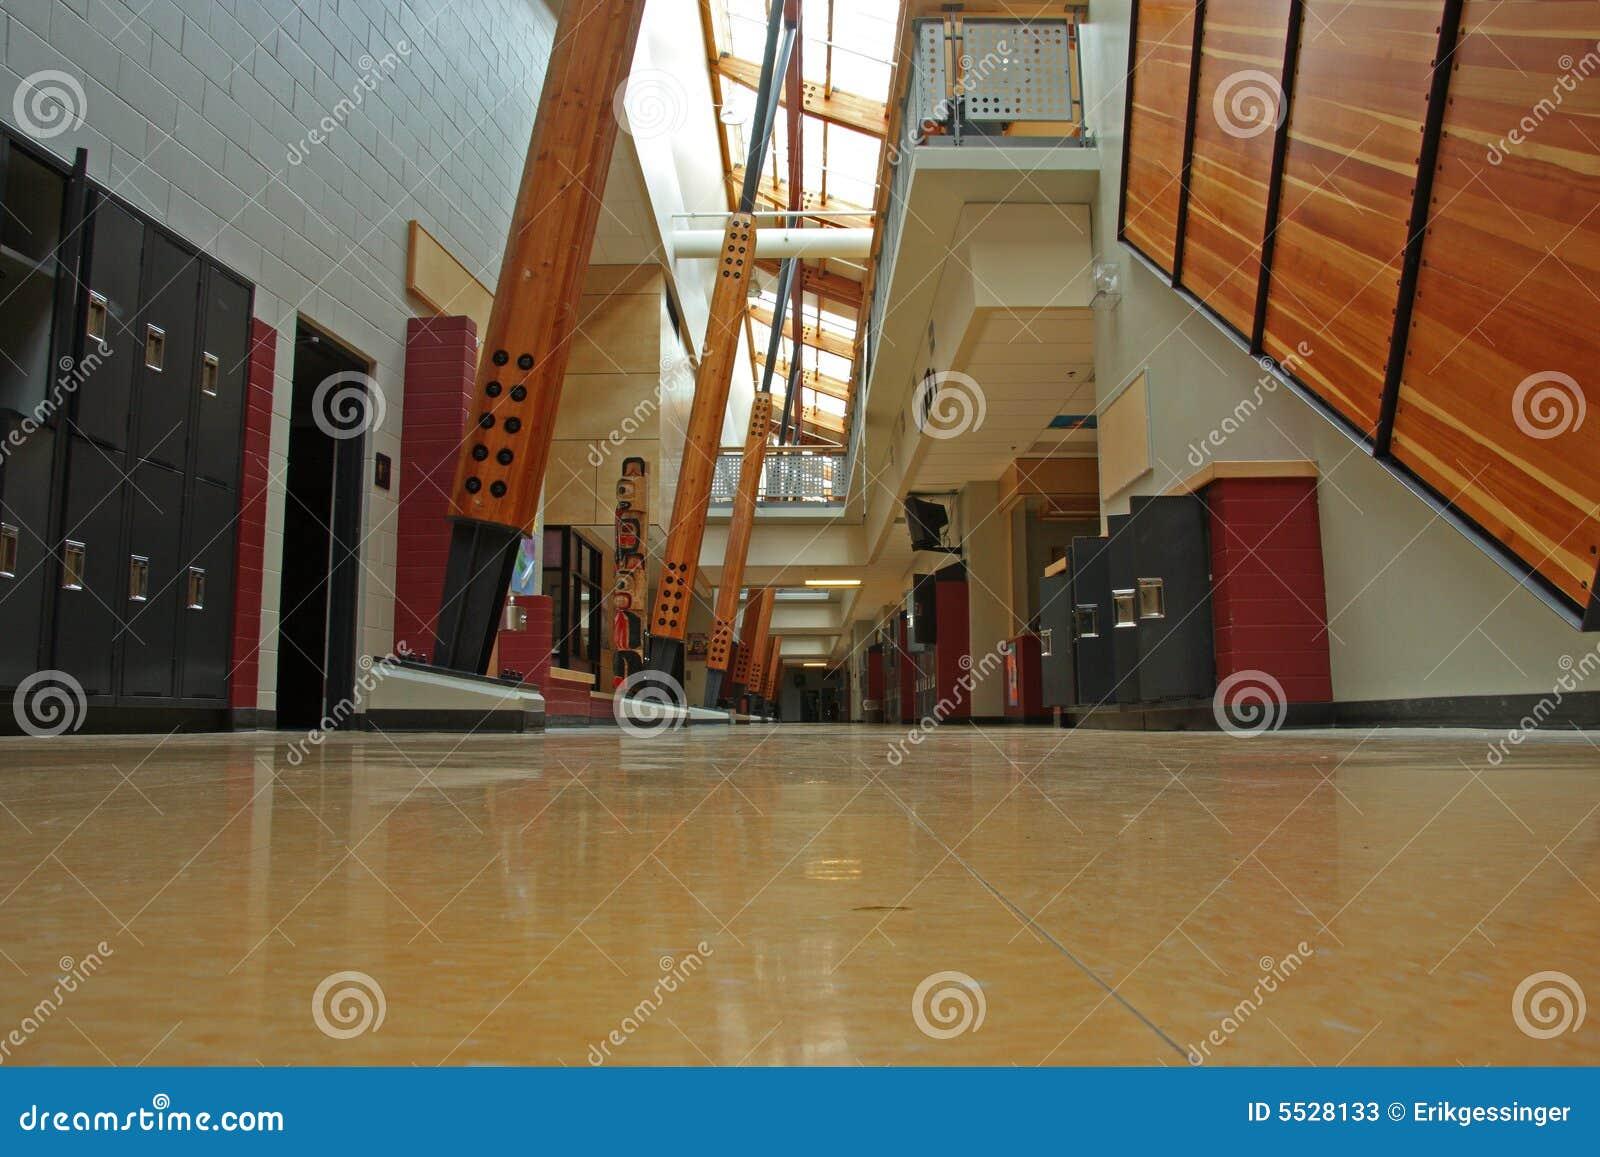 school hallway clip art - photo #48